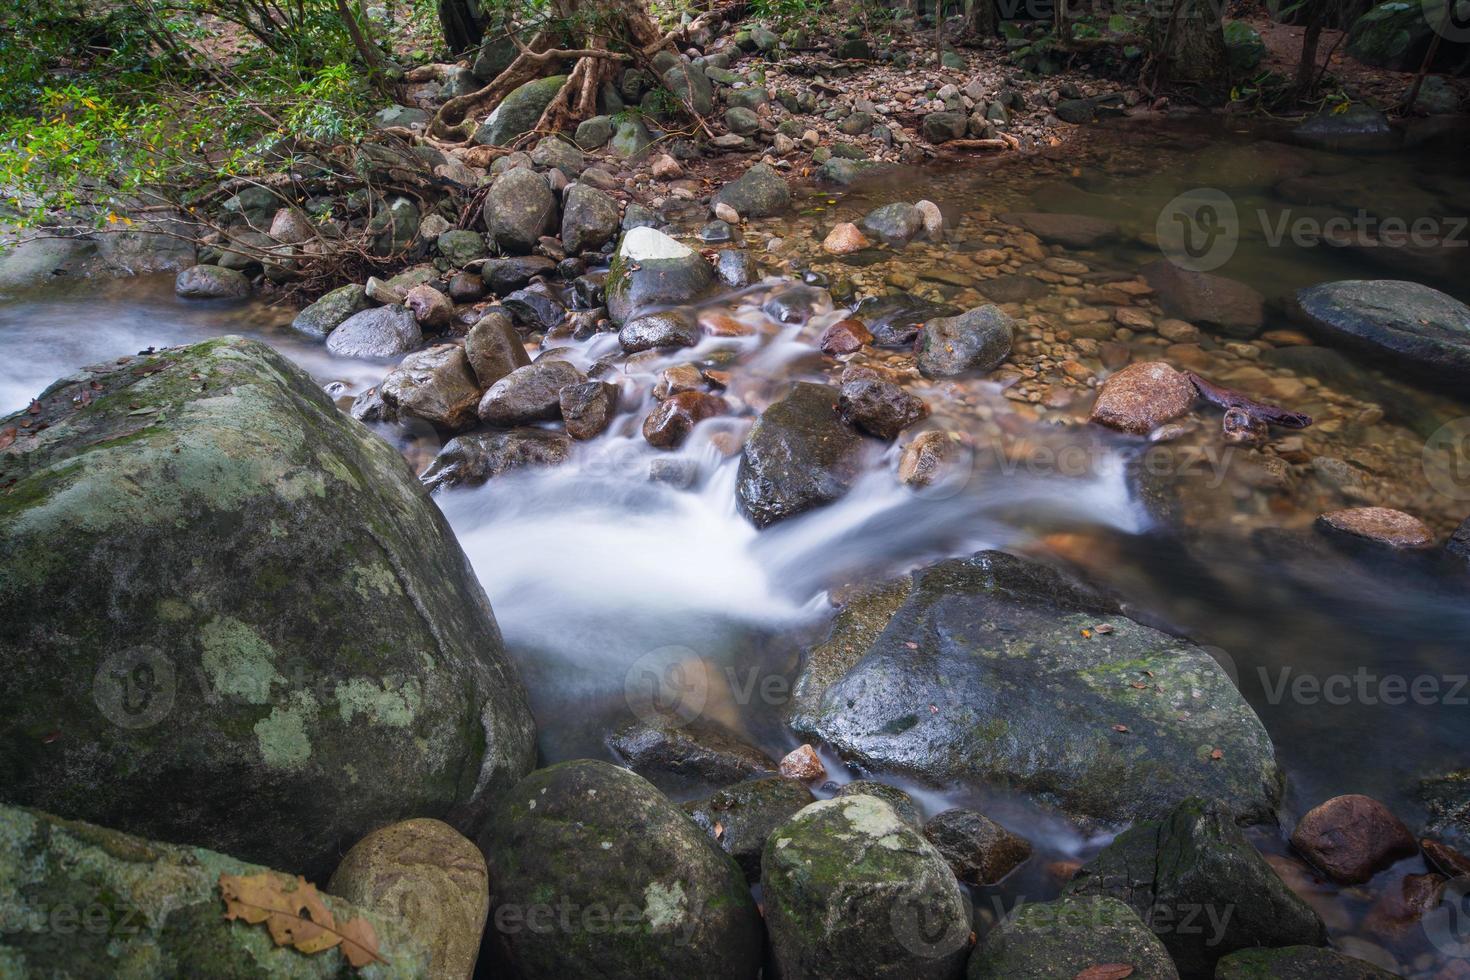 khlong pla kang vattenfall. foto